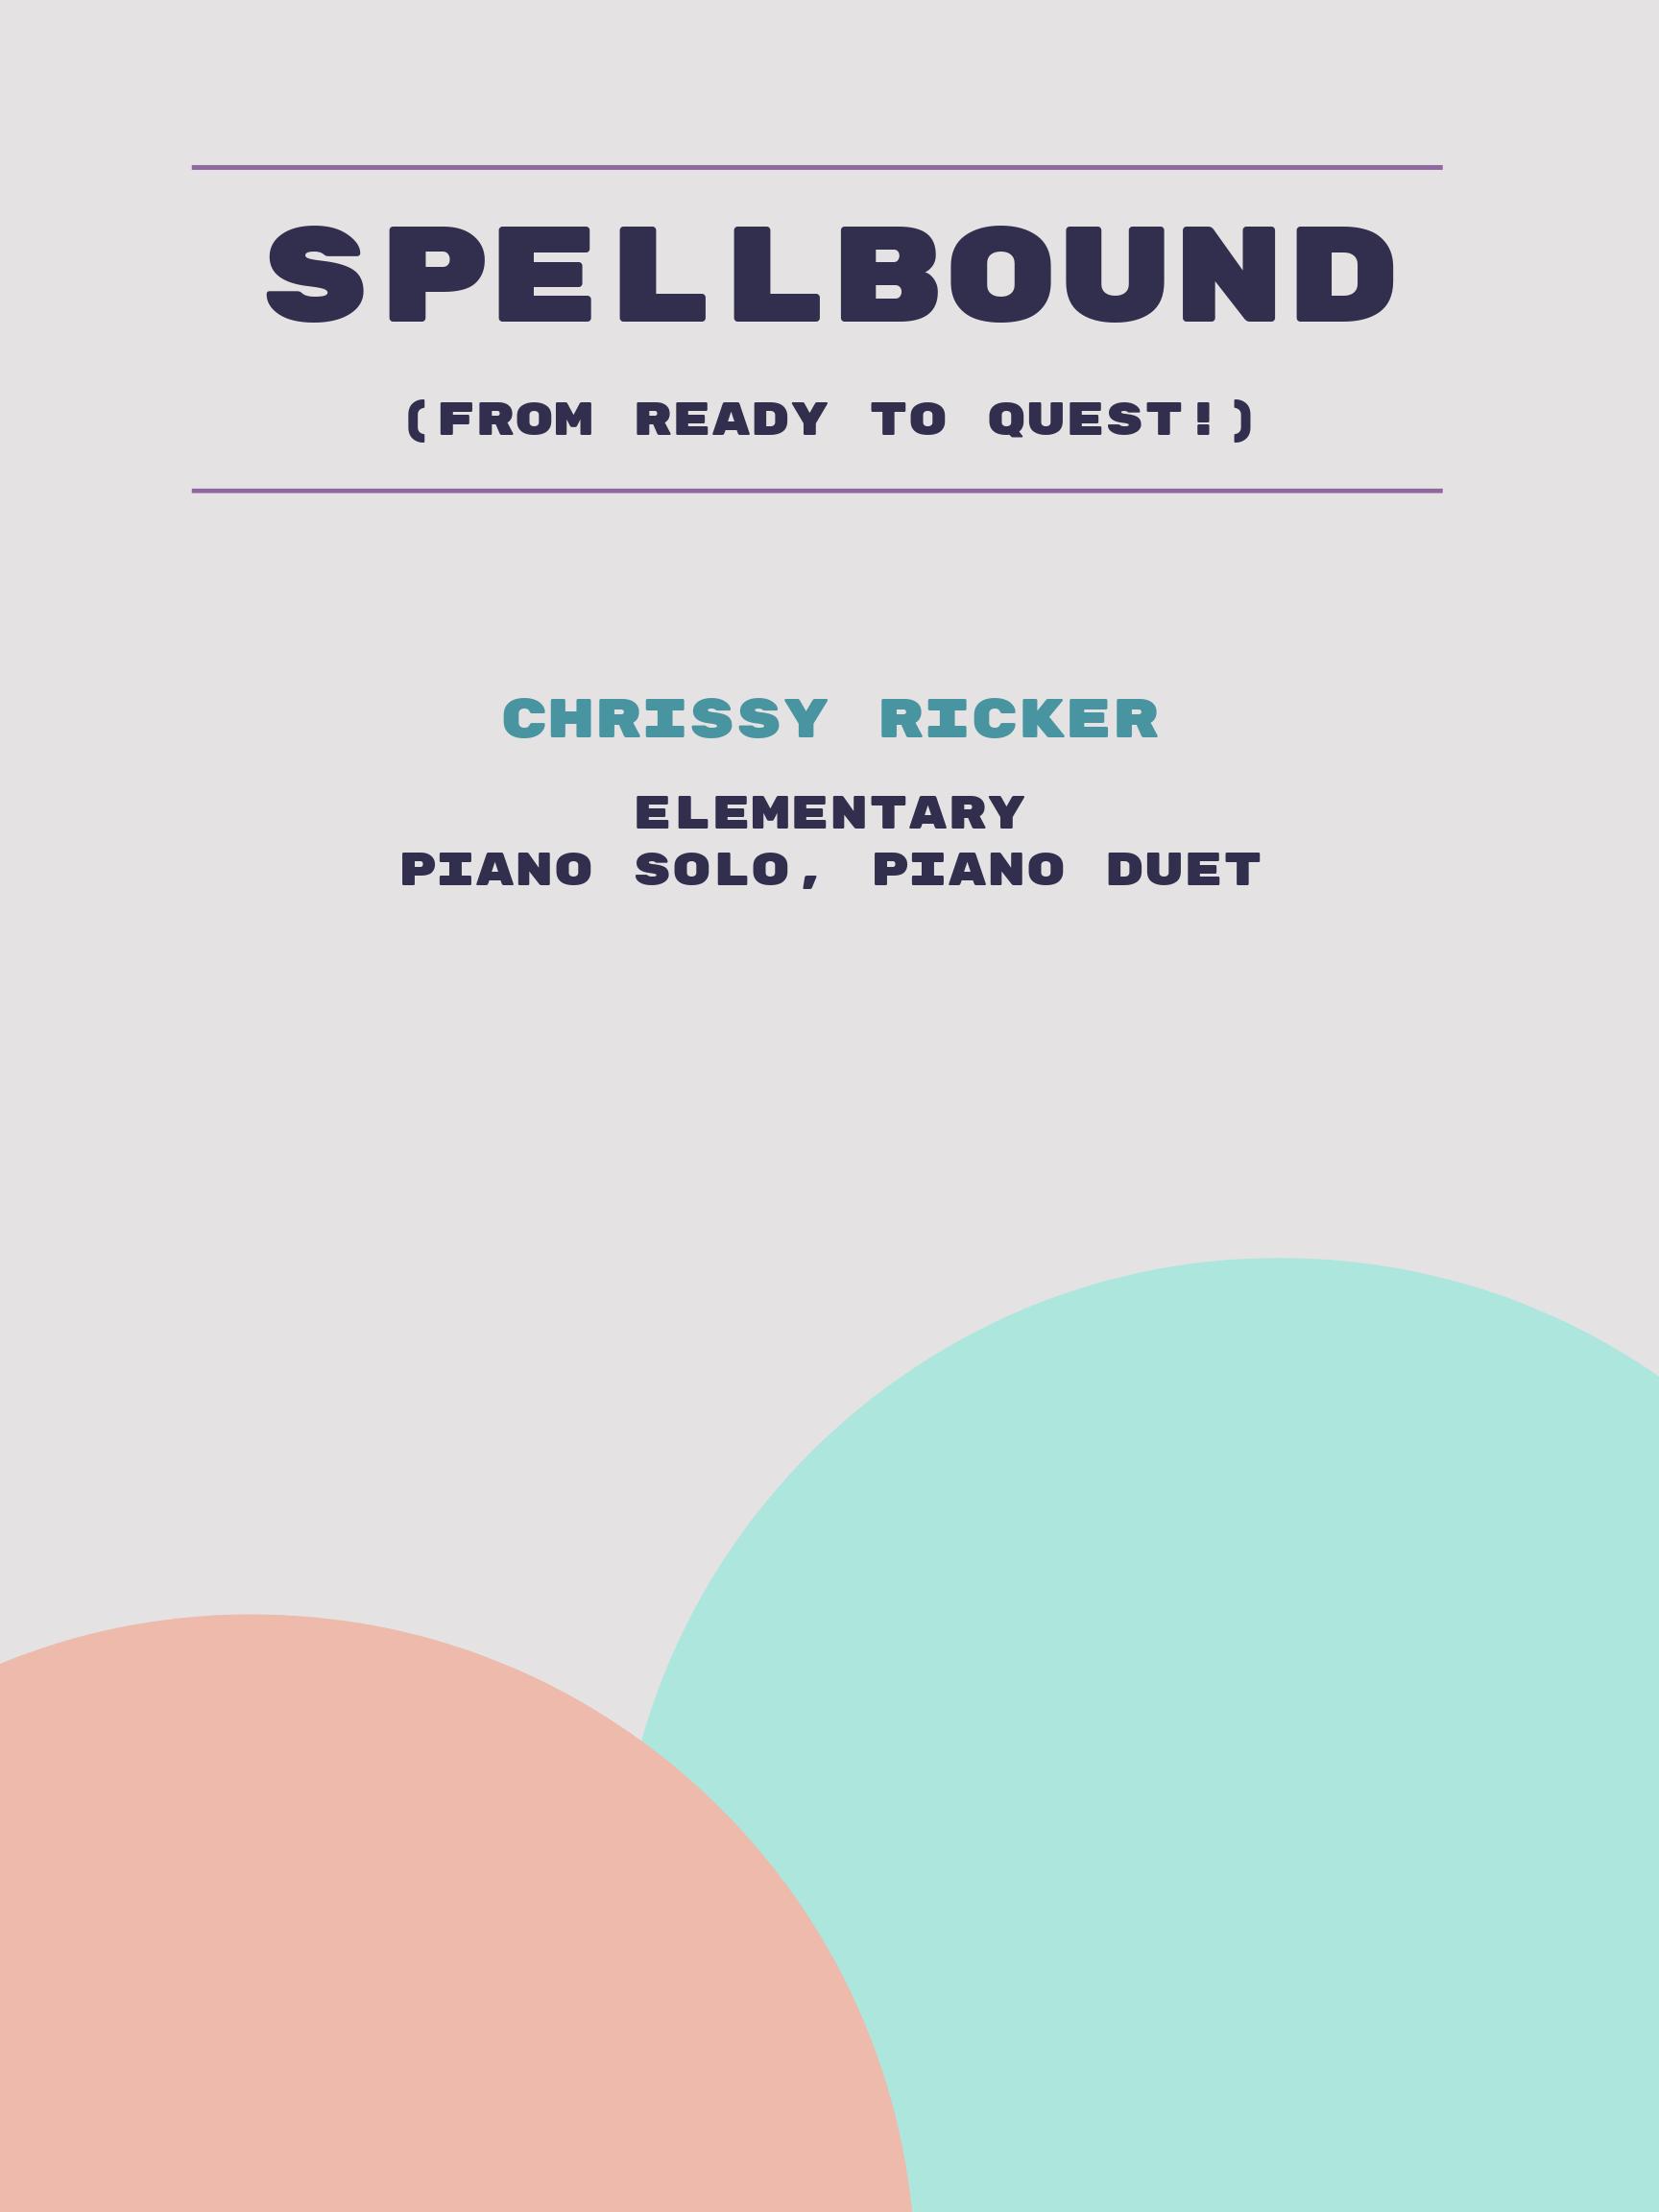 Spellbound by Chrissy Ricker